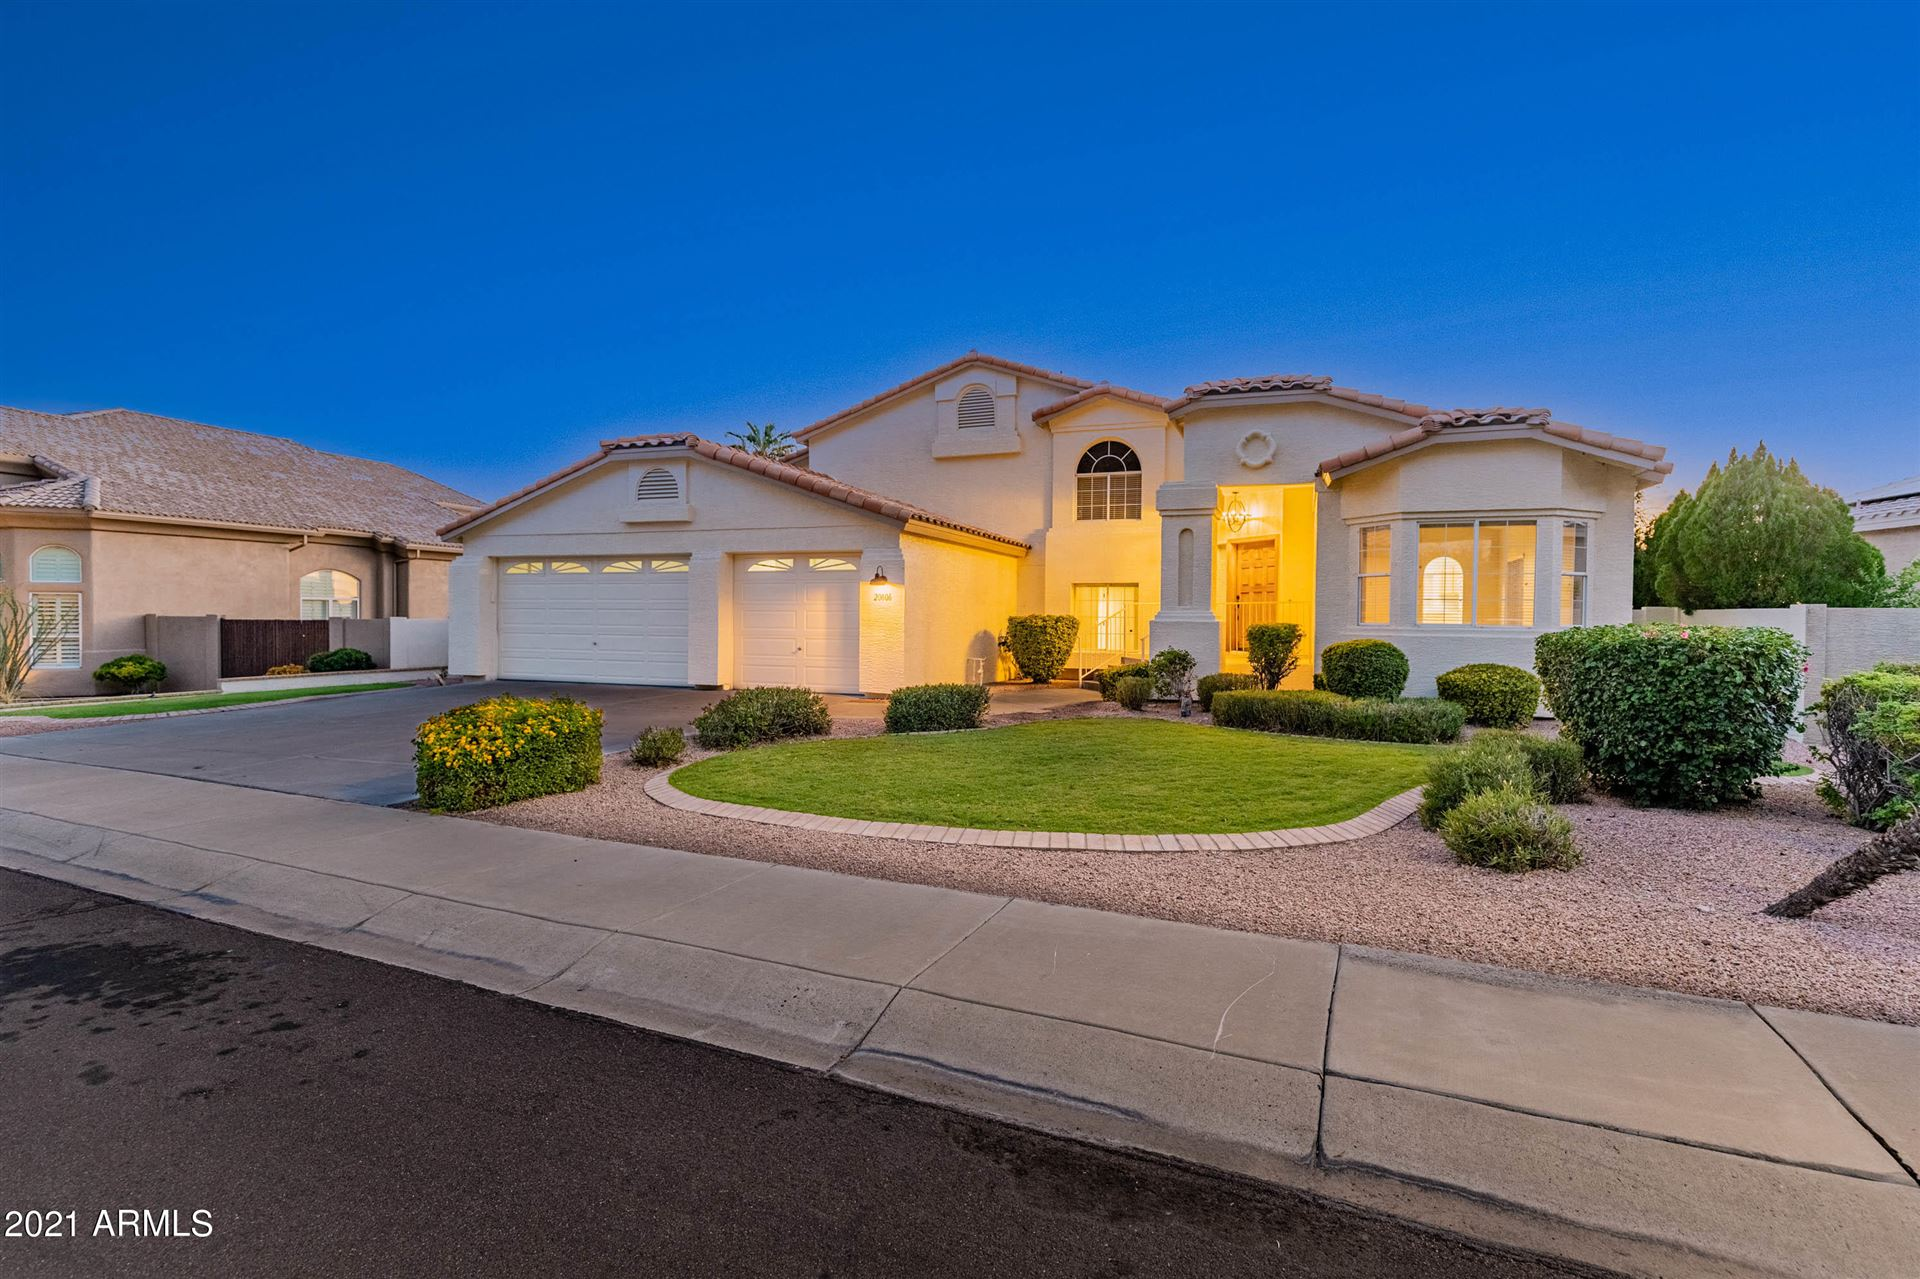 20806 N 52ND Avenue, Glendale, AZ 85308 - MLS#: 6273344